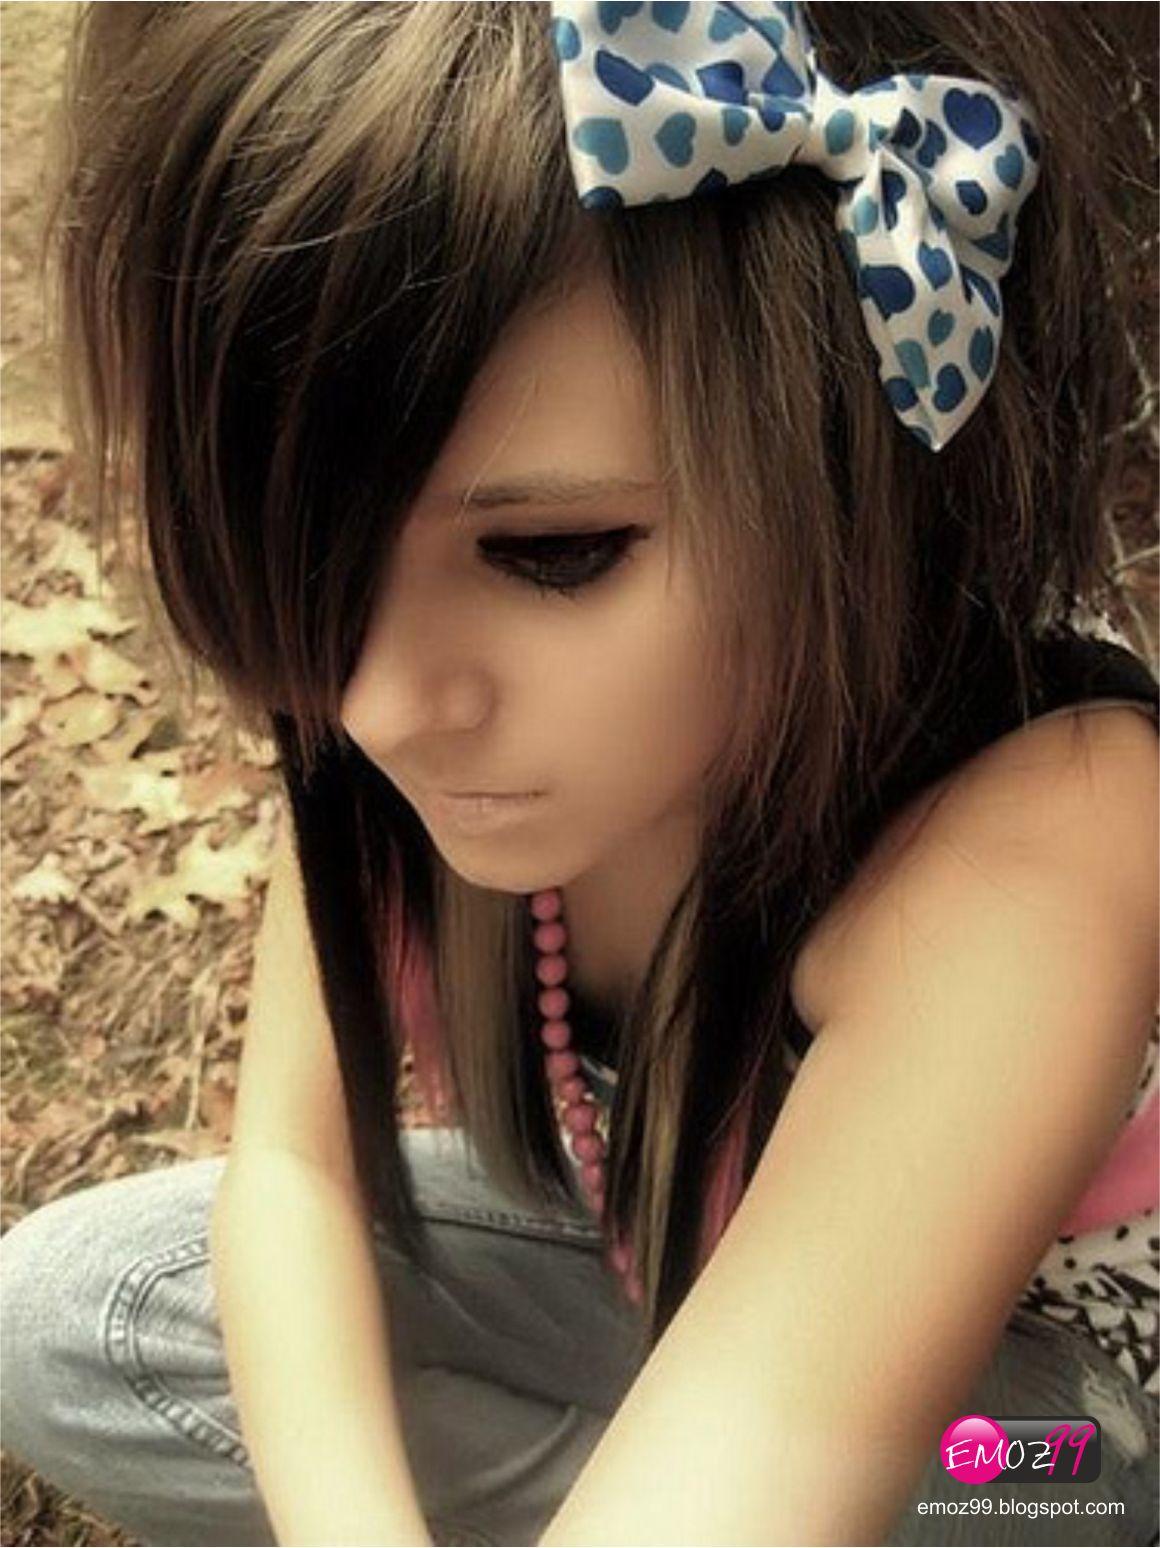 Emo's World: 2012 Cute Emo Girl